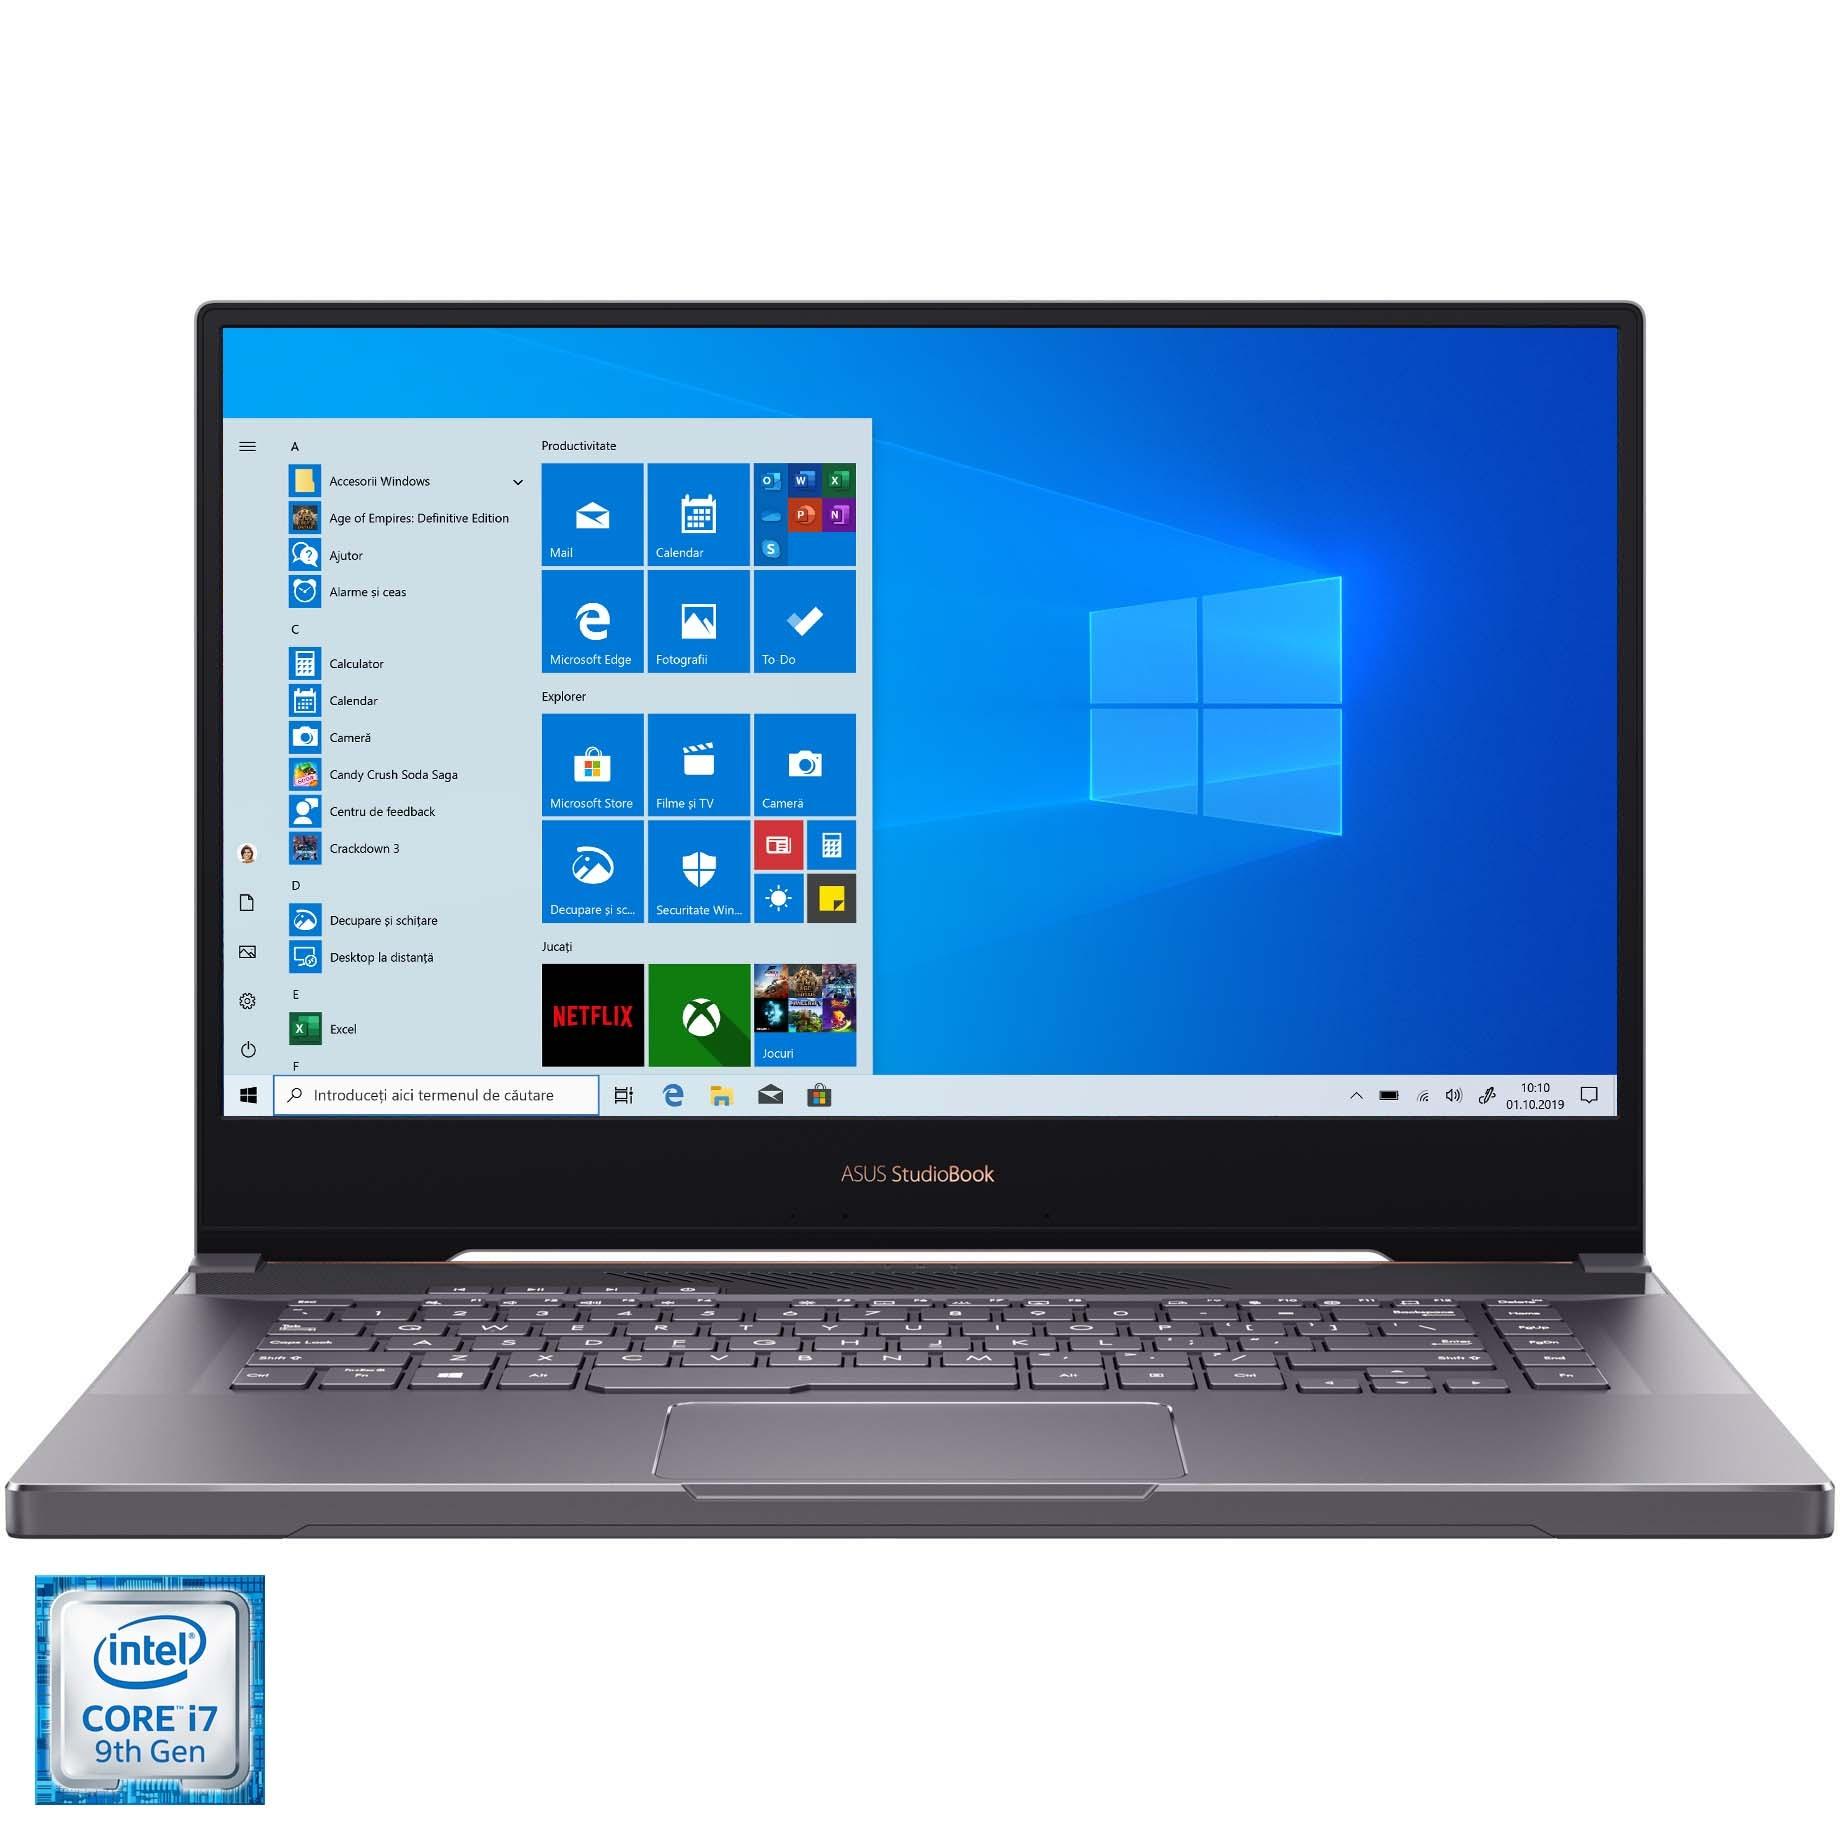 "Fotografie Laptop ASUS Pro Art StudioBook 15 H500GV cu procesor Intel® Core™ i7-9750H pana la 4.50 GHz, 15.6"", 4K, UHD, 32GB, 1TB SSD, NVIDIA® GeForce® RTX 2060 6GB, Windows 10 Pro, Star Grey"